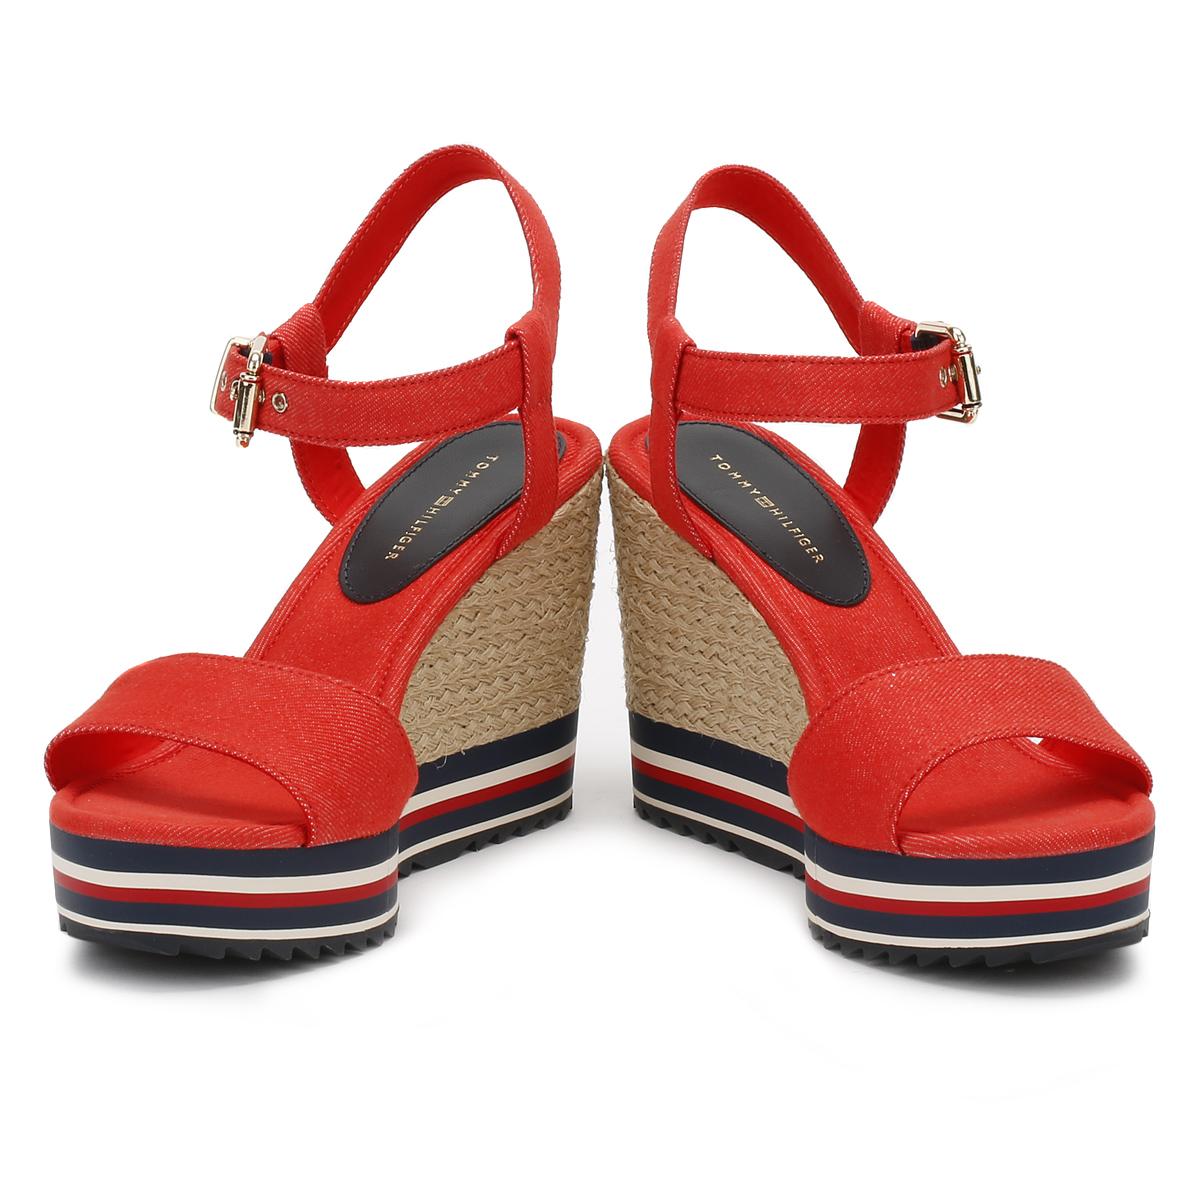 583e68bd24ee Tommy Hilfiger Womens Red   Black Wedge Sandals